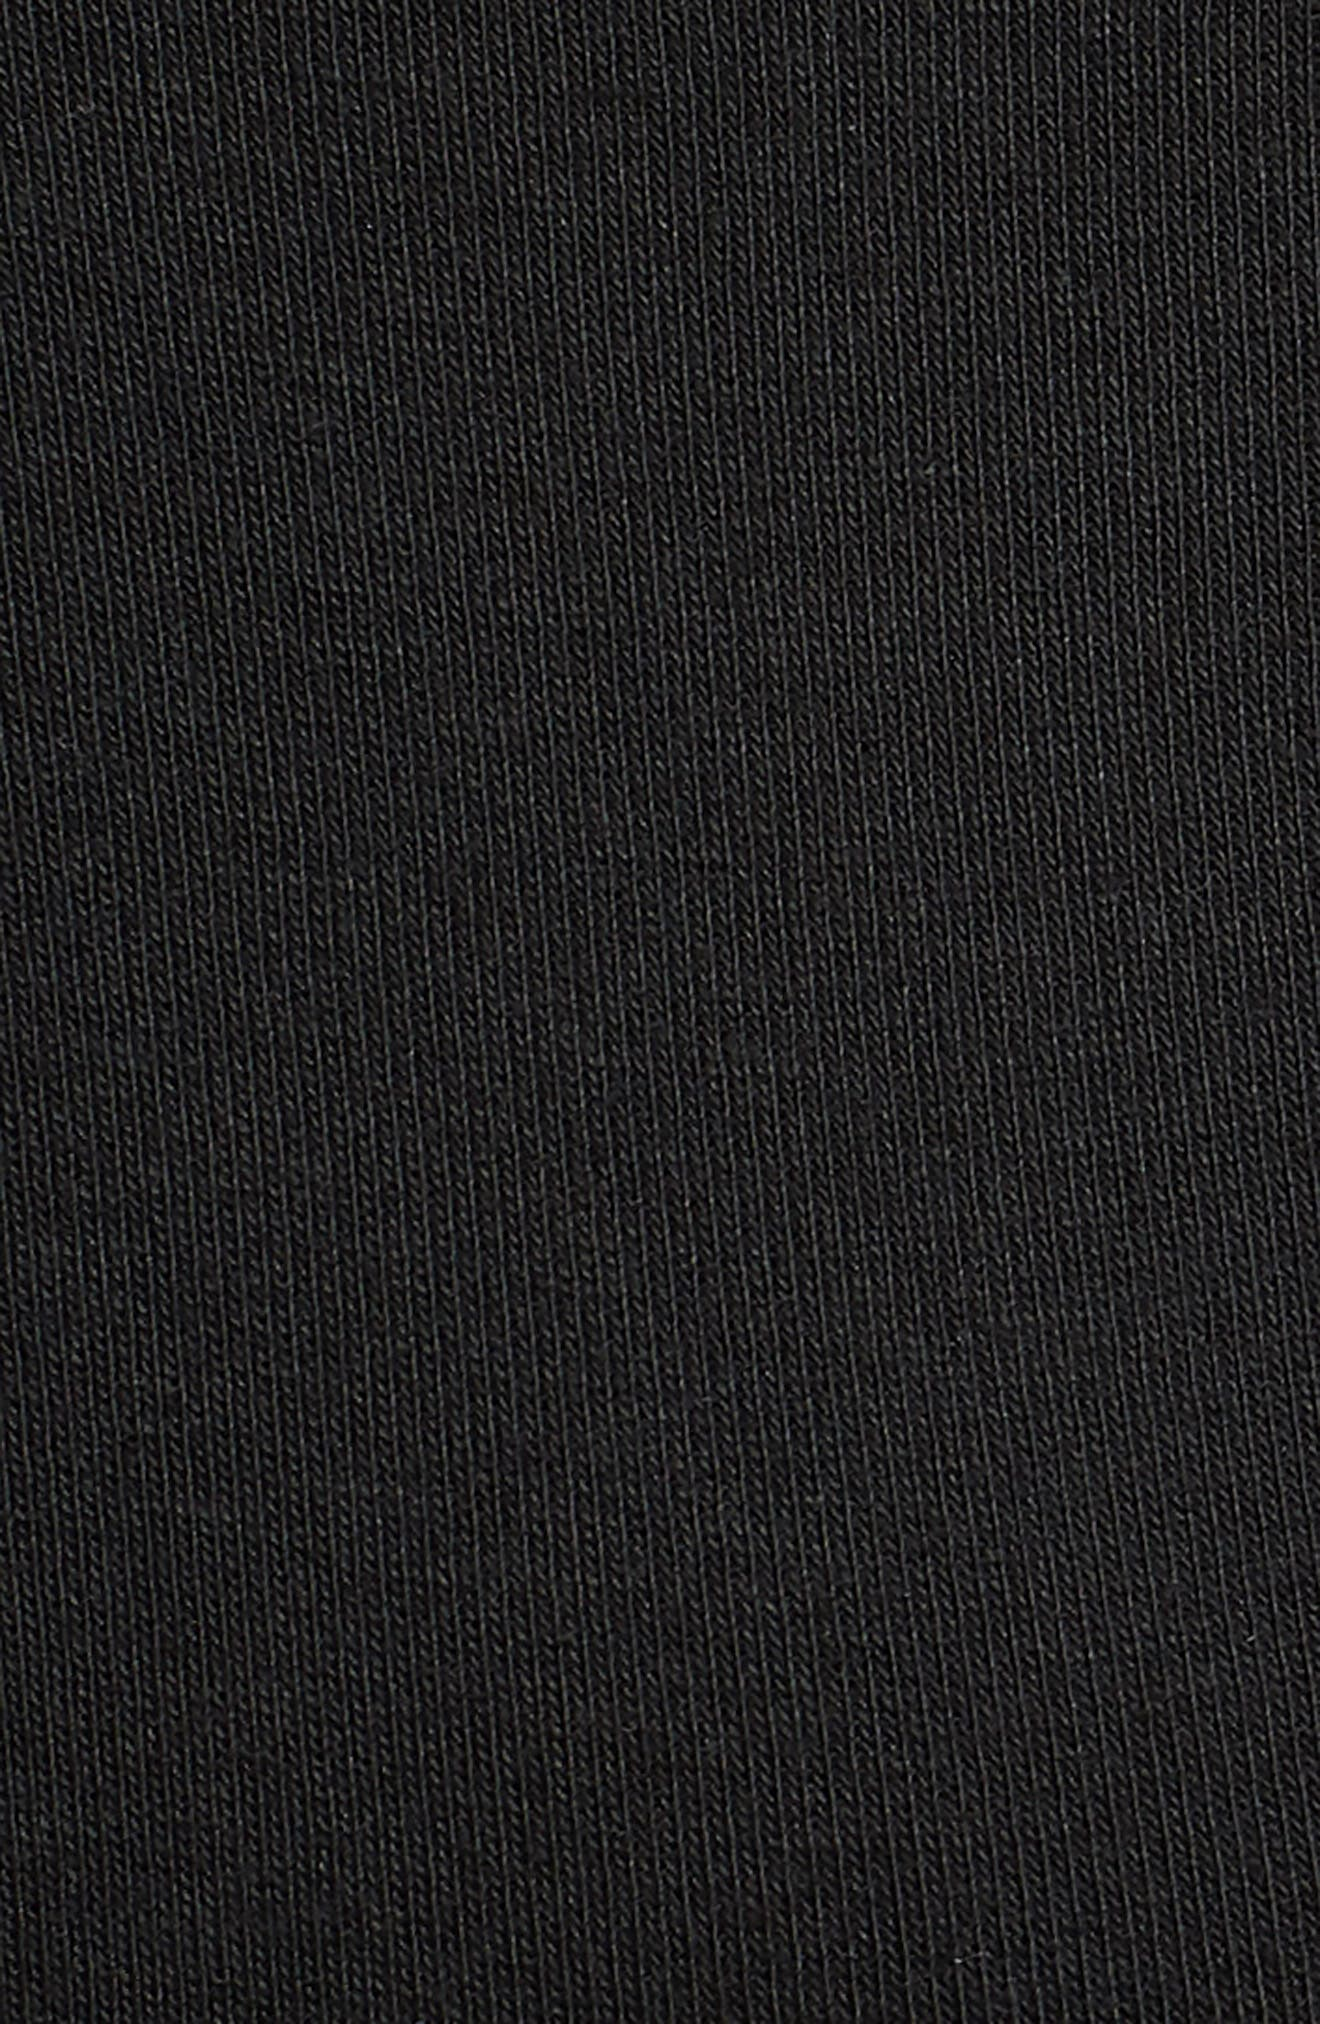 Collection Cotton Trunks,                             Alternate thumbnail 5, color,                             001